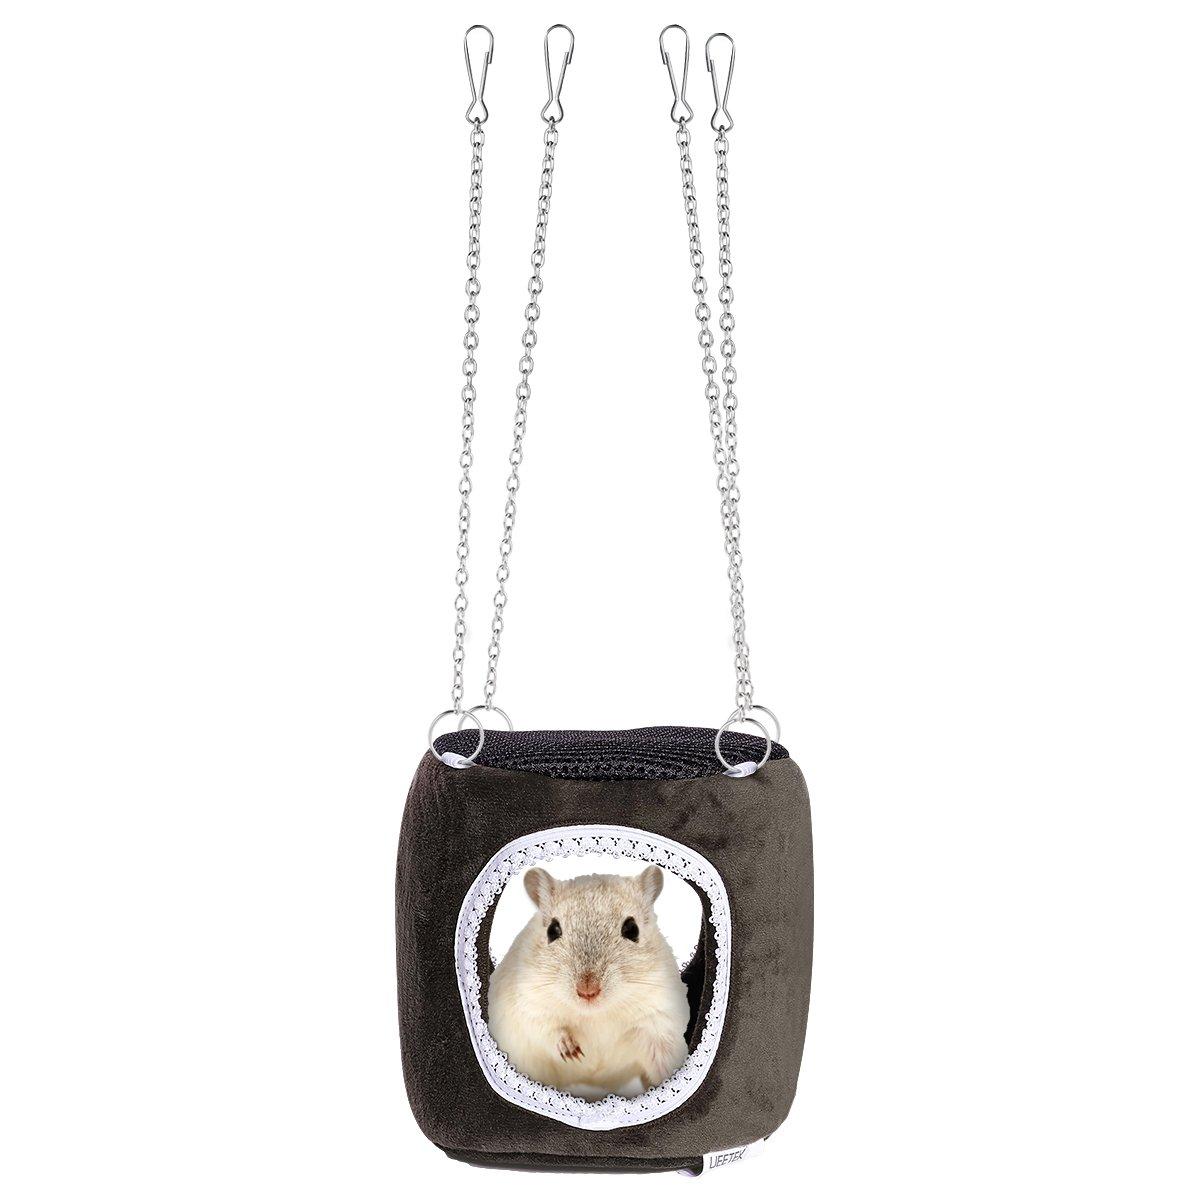 UEETEK Petit hamac animalier Hanging Snuggle Cave Hut pour Hamster Squirrel Chinchilla Guinée